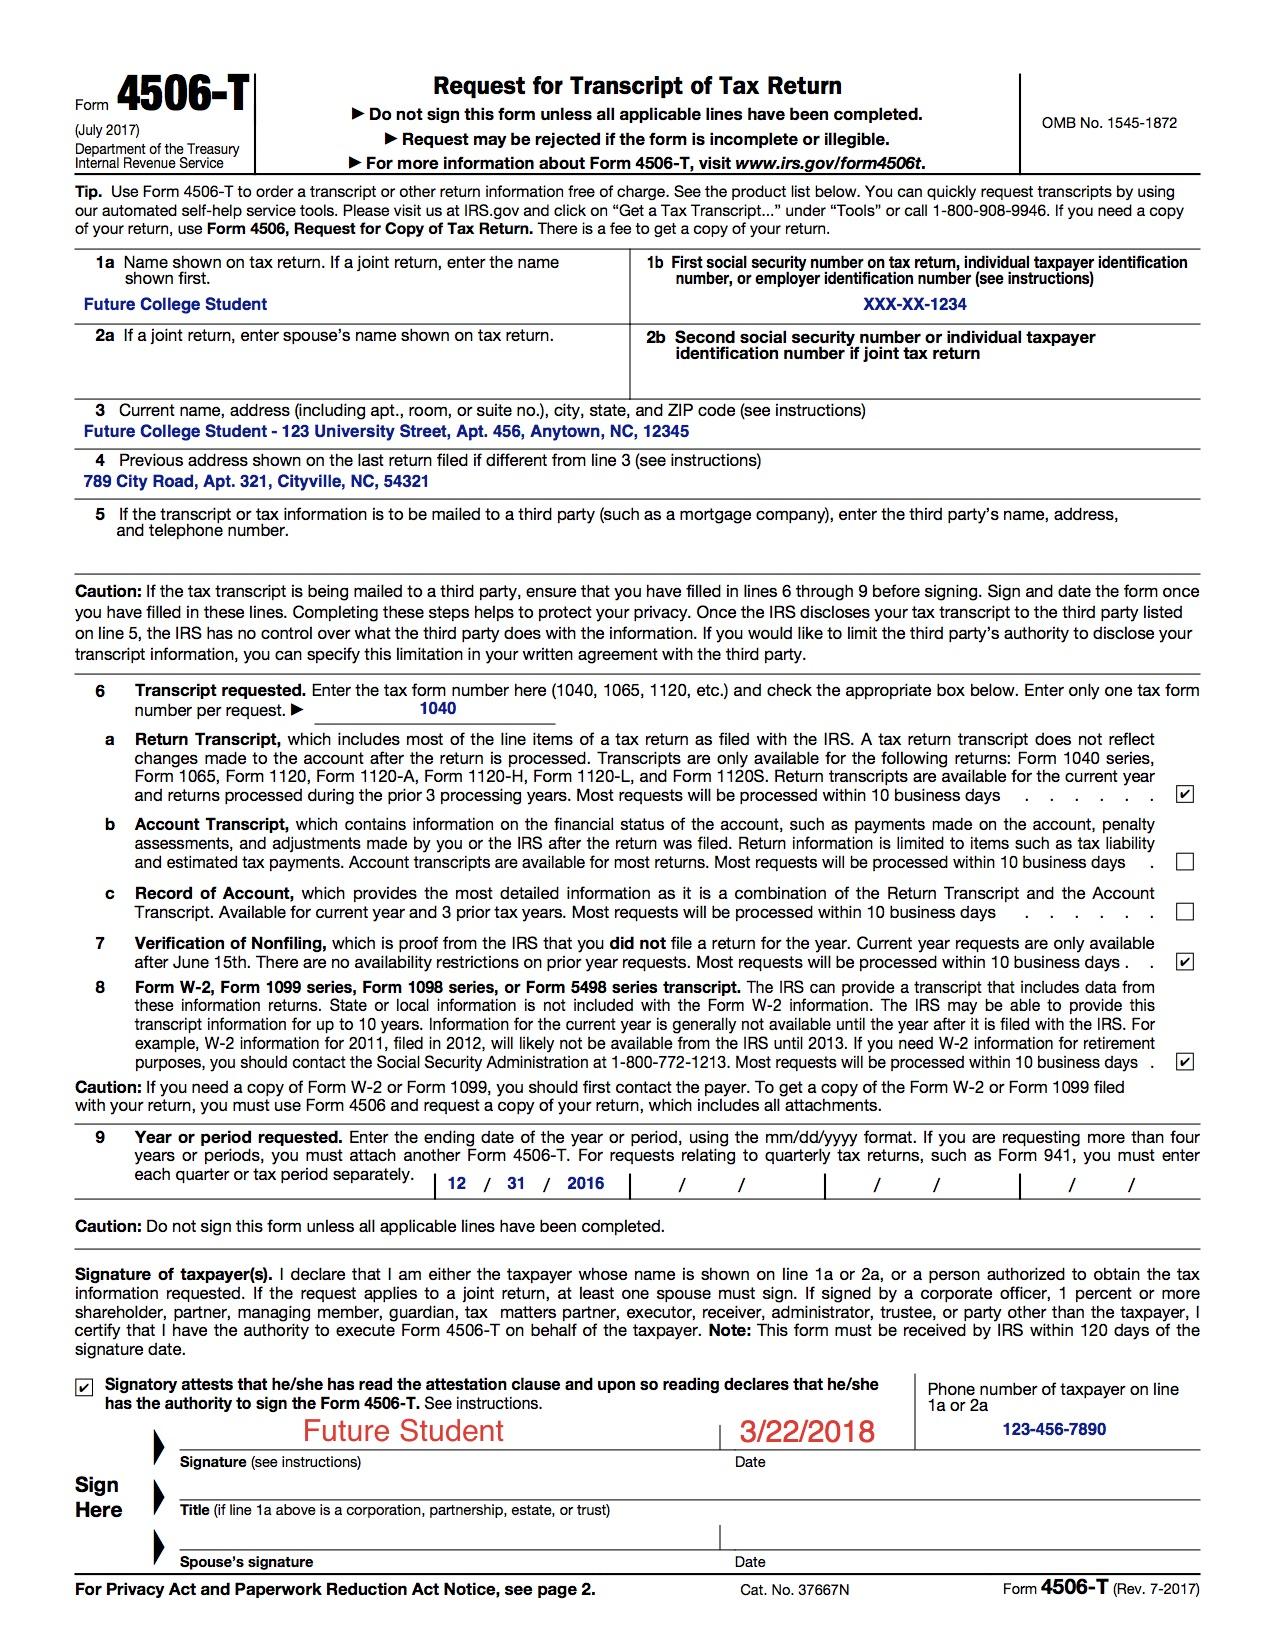 Fafsa Verification Dubc2college